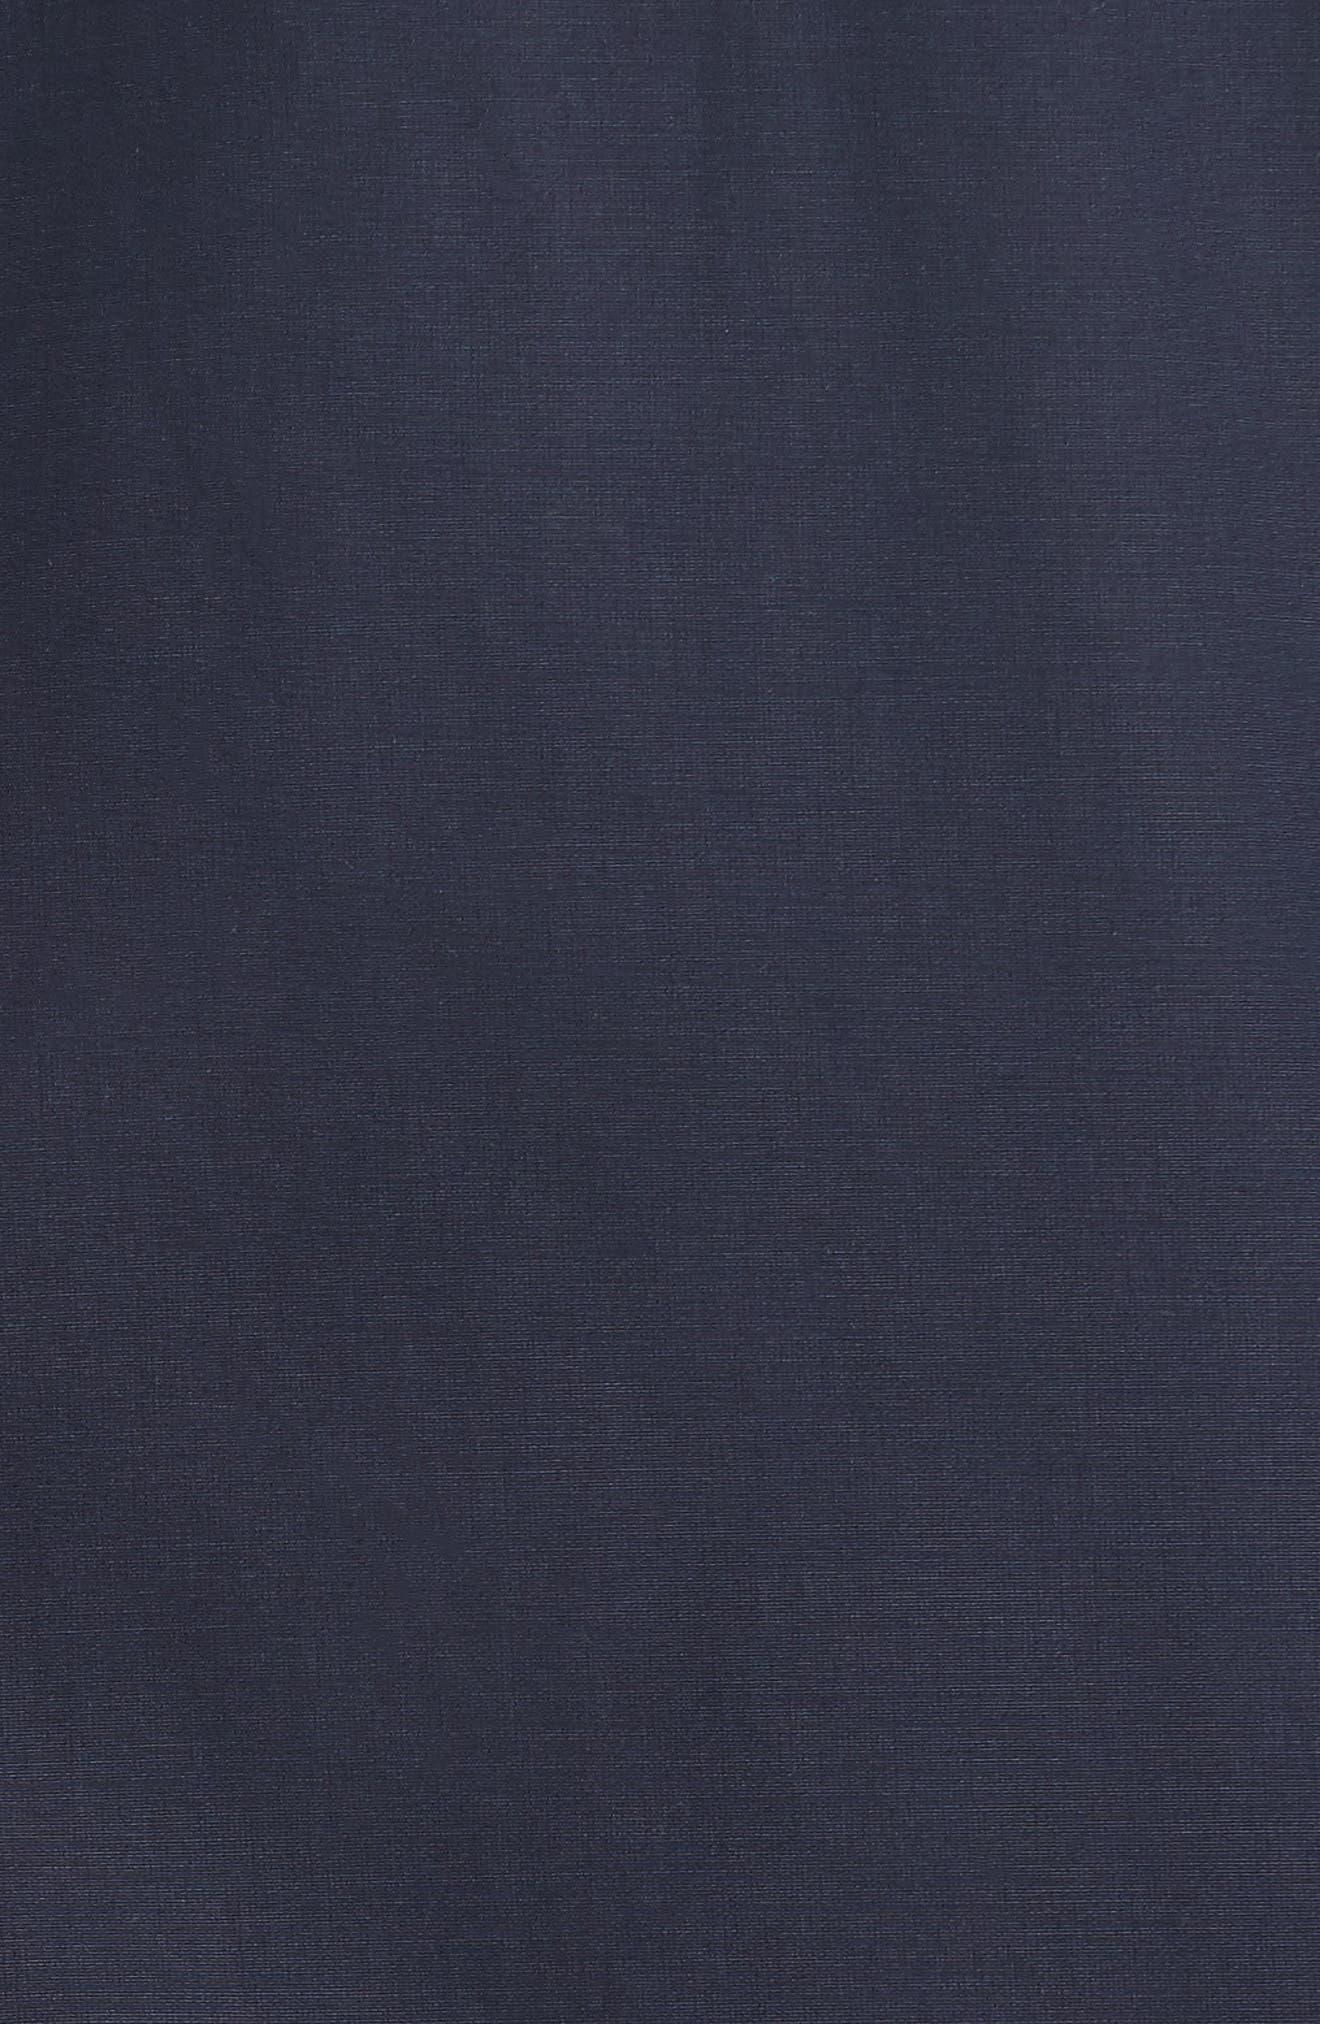 Zip Hooded Jacket,                             Alternate thumbnail 5, color,                             NAVY BLUE